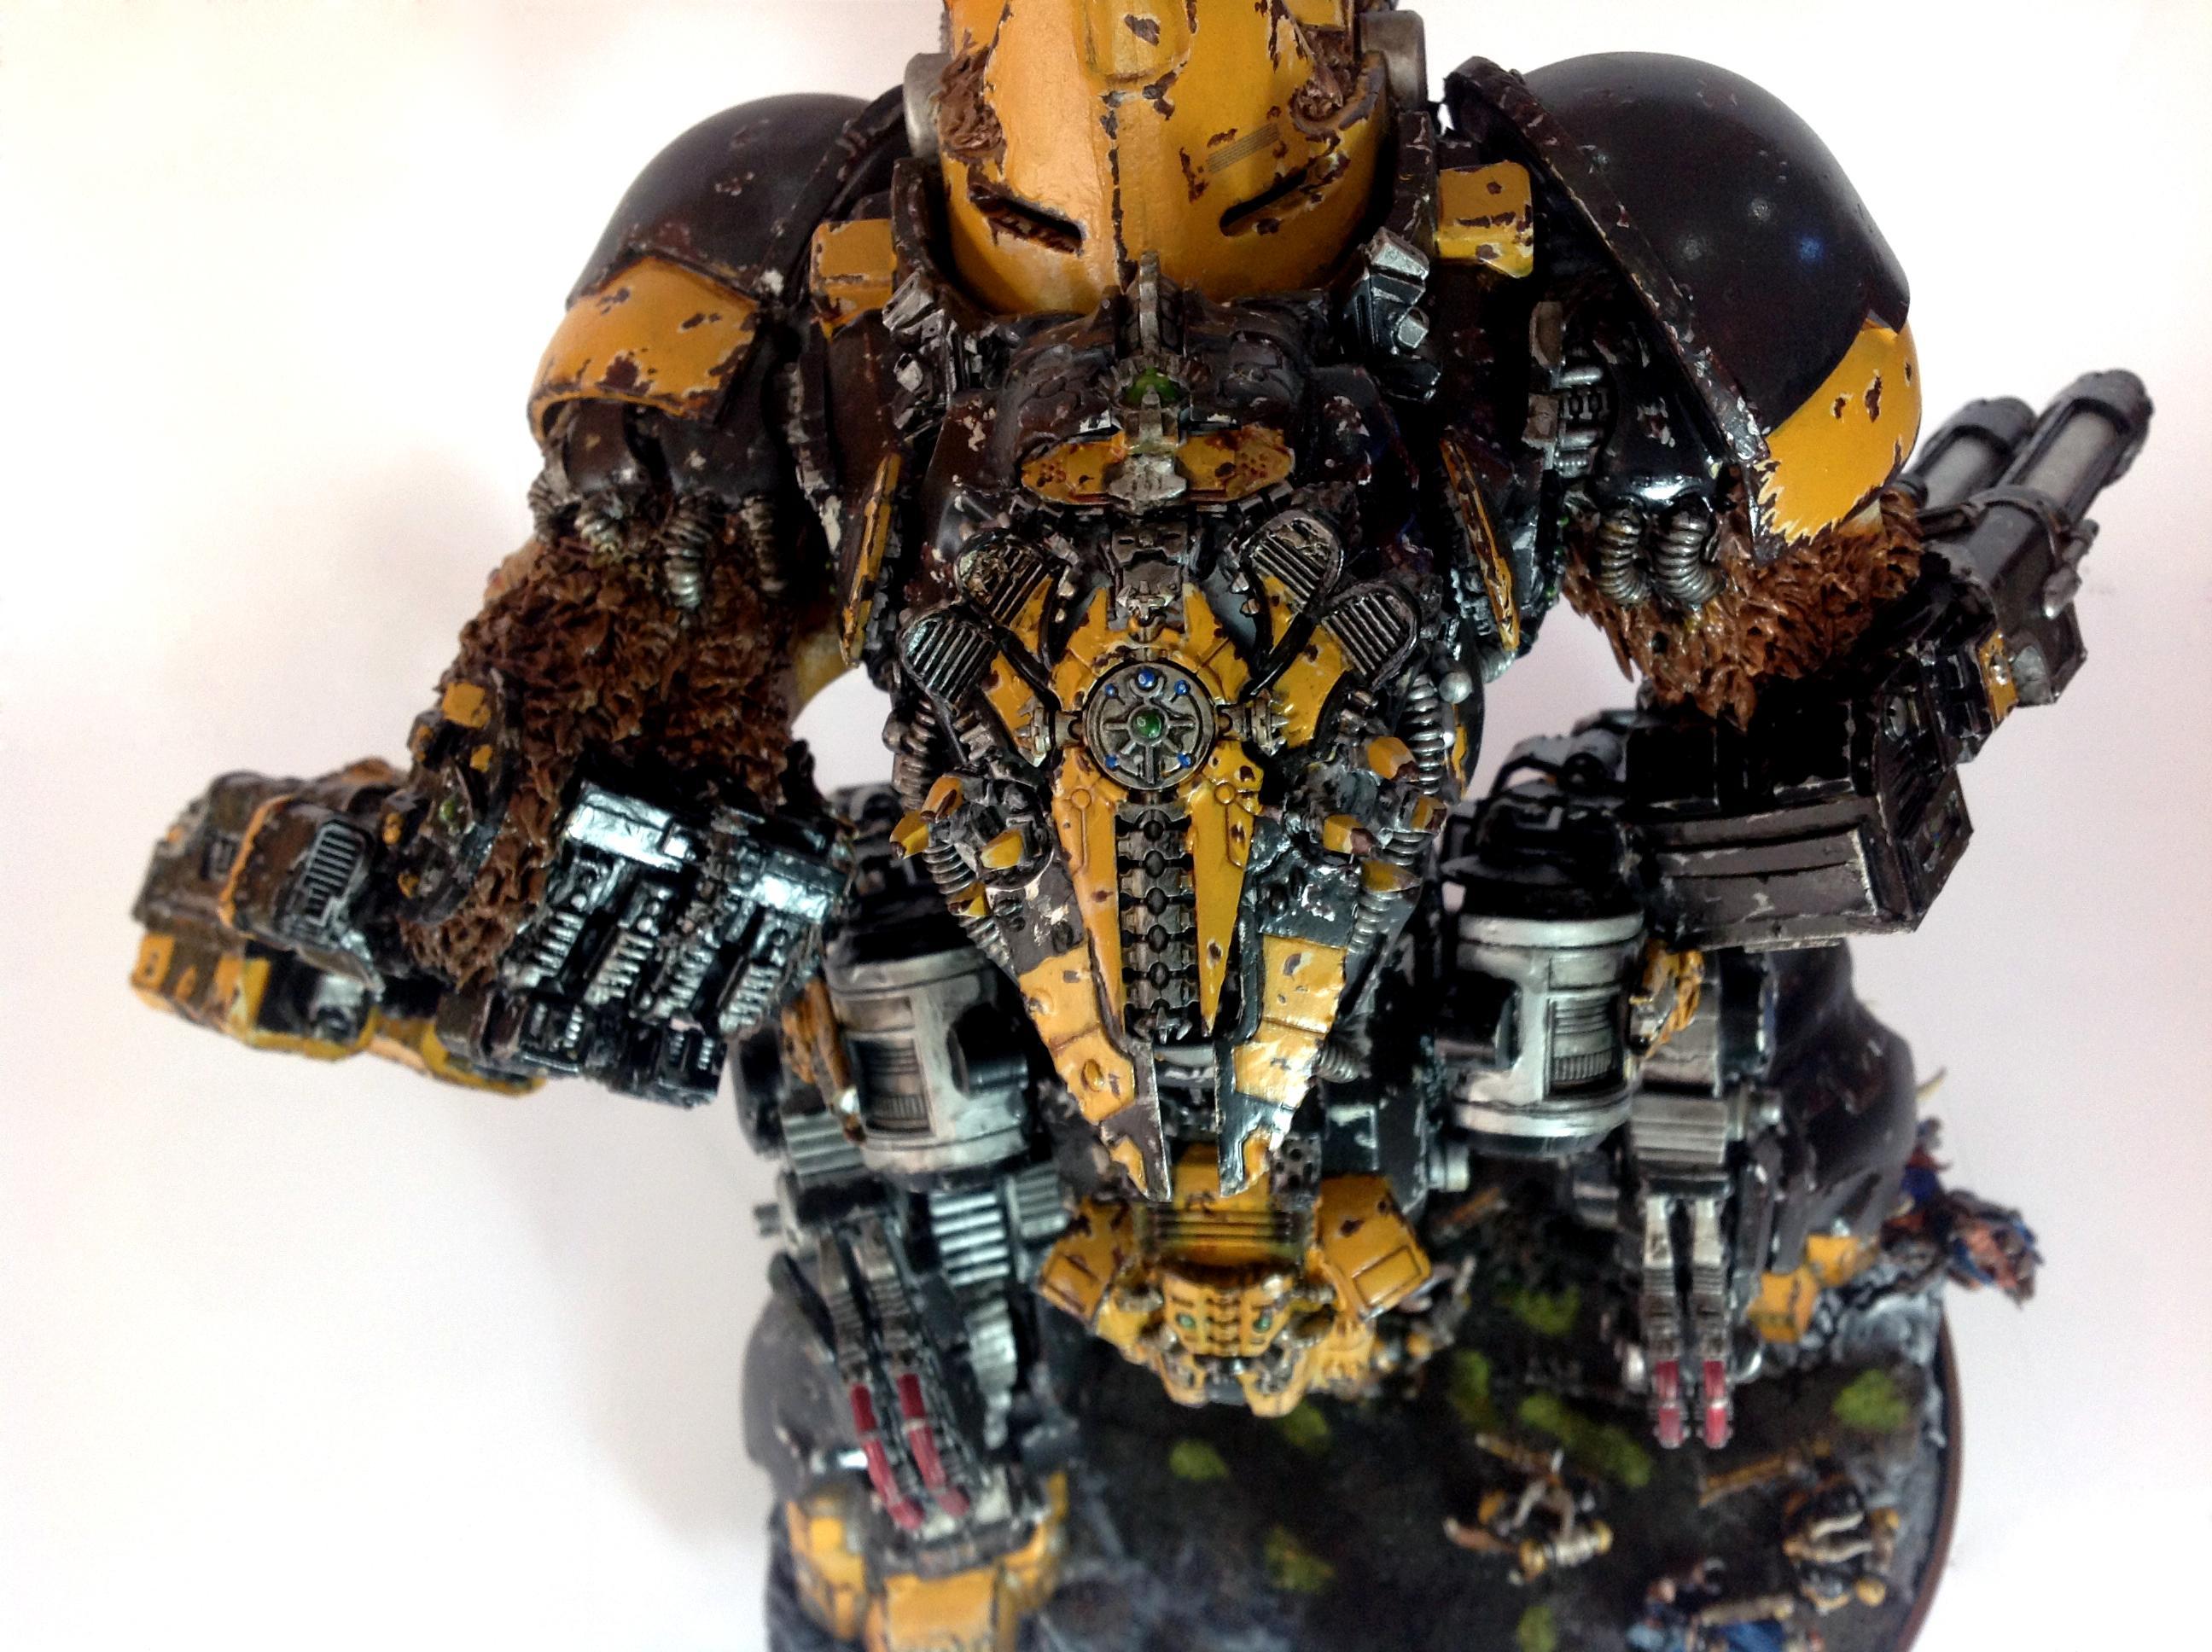 Beast, Beastmen, Cygor, Mercenary, Metal, Pattern, Space, Space Marines, Titan, Warhammer 40,000, Warhound, Wolves